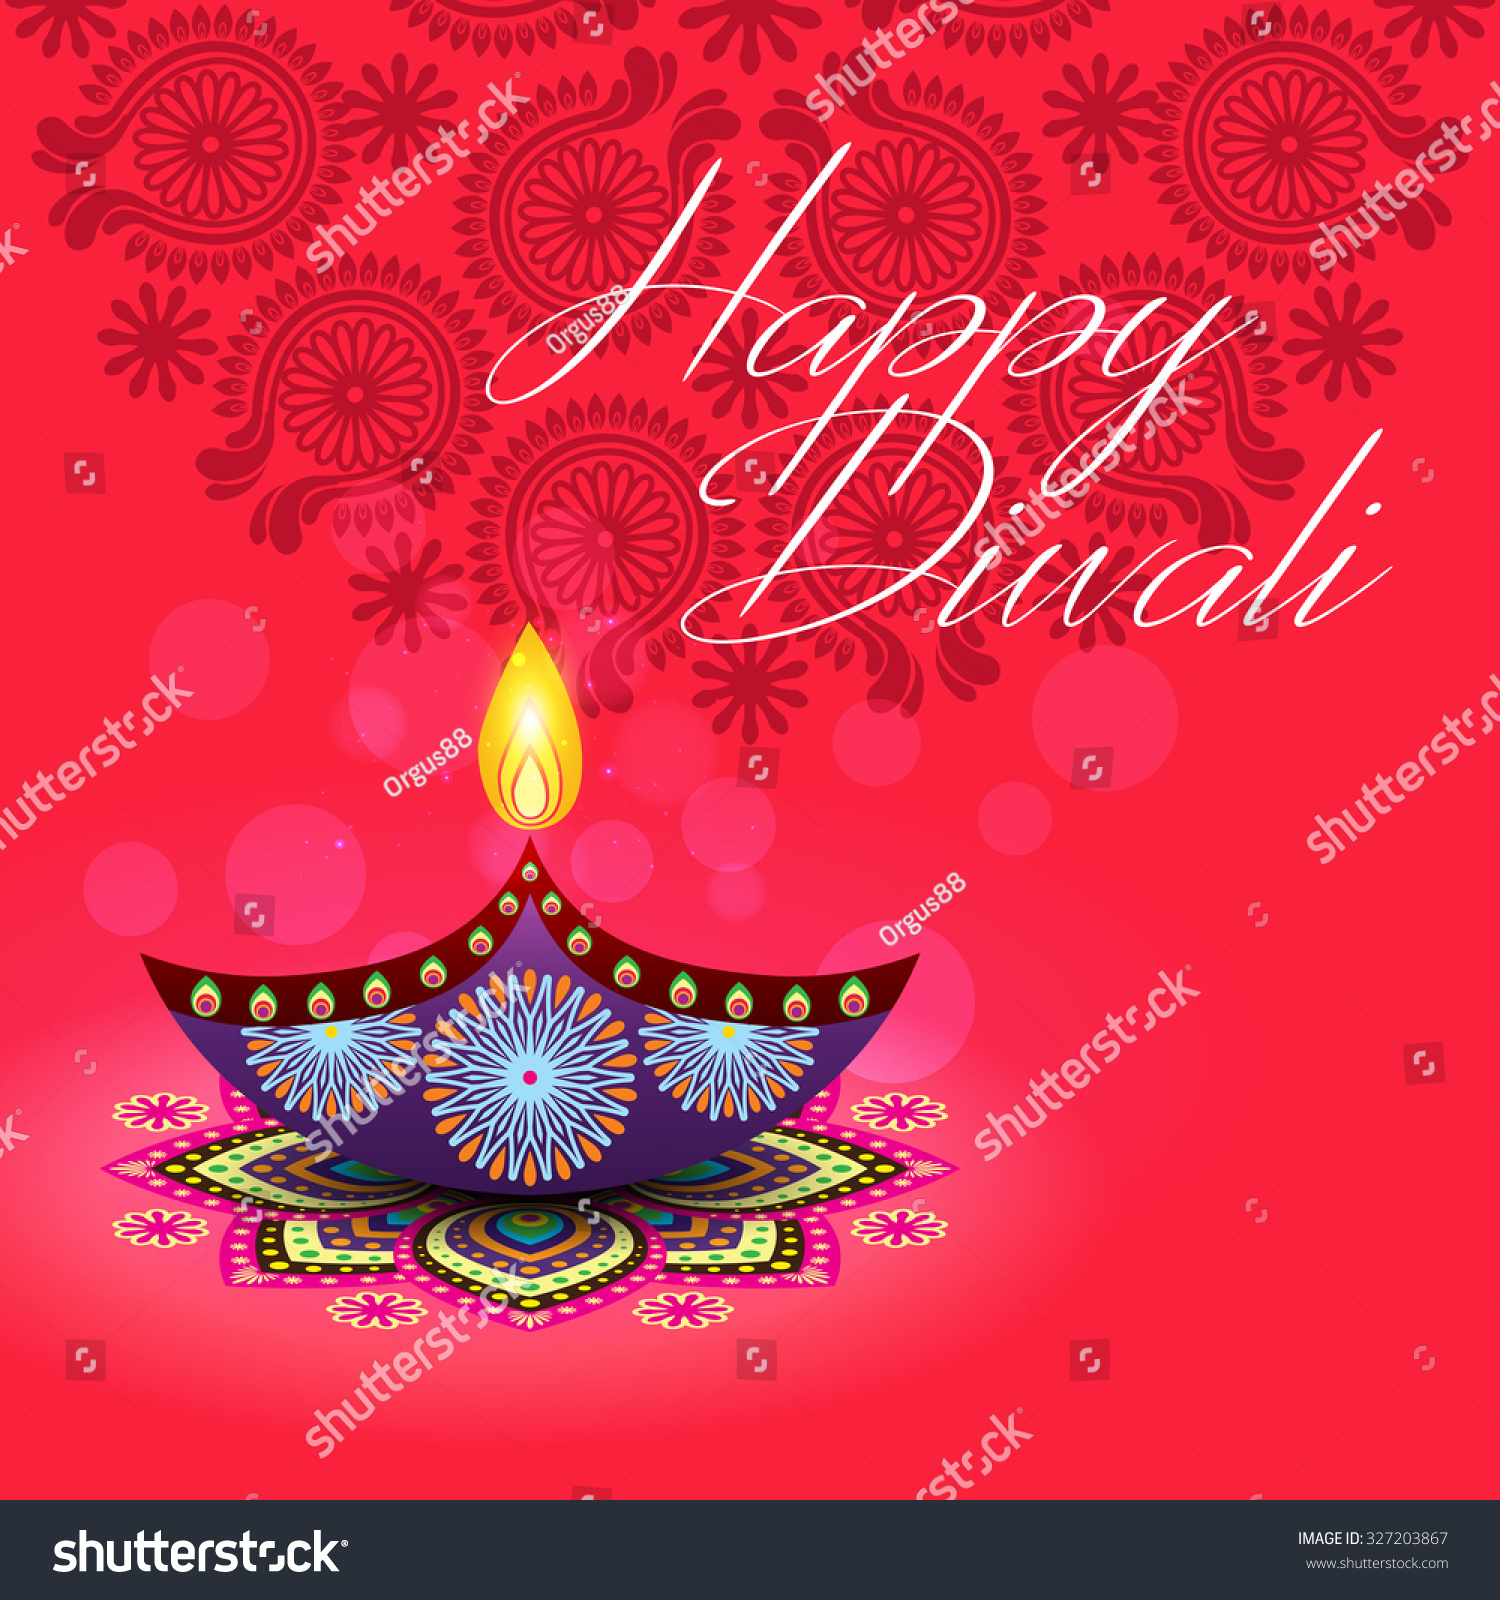 Beautiful Greeting Card For Hindu Community Festival Diwali Happy